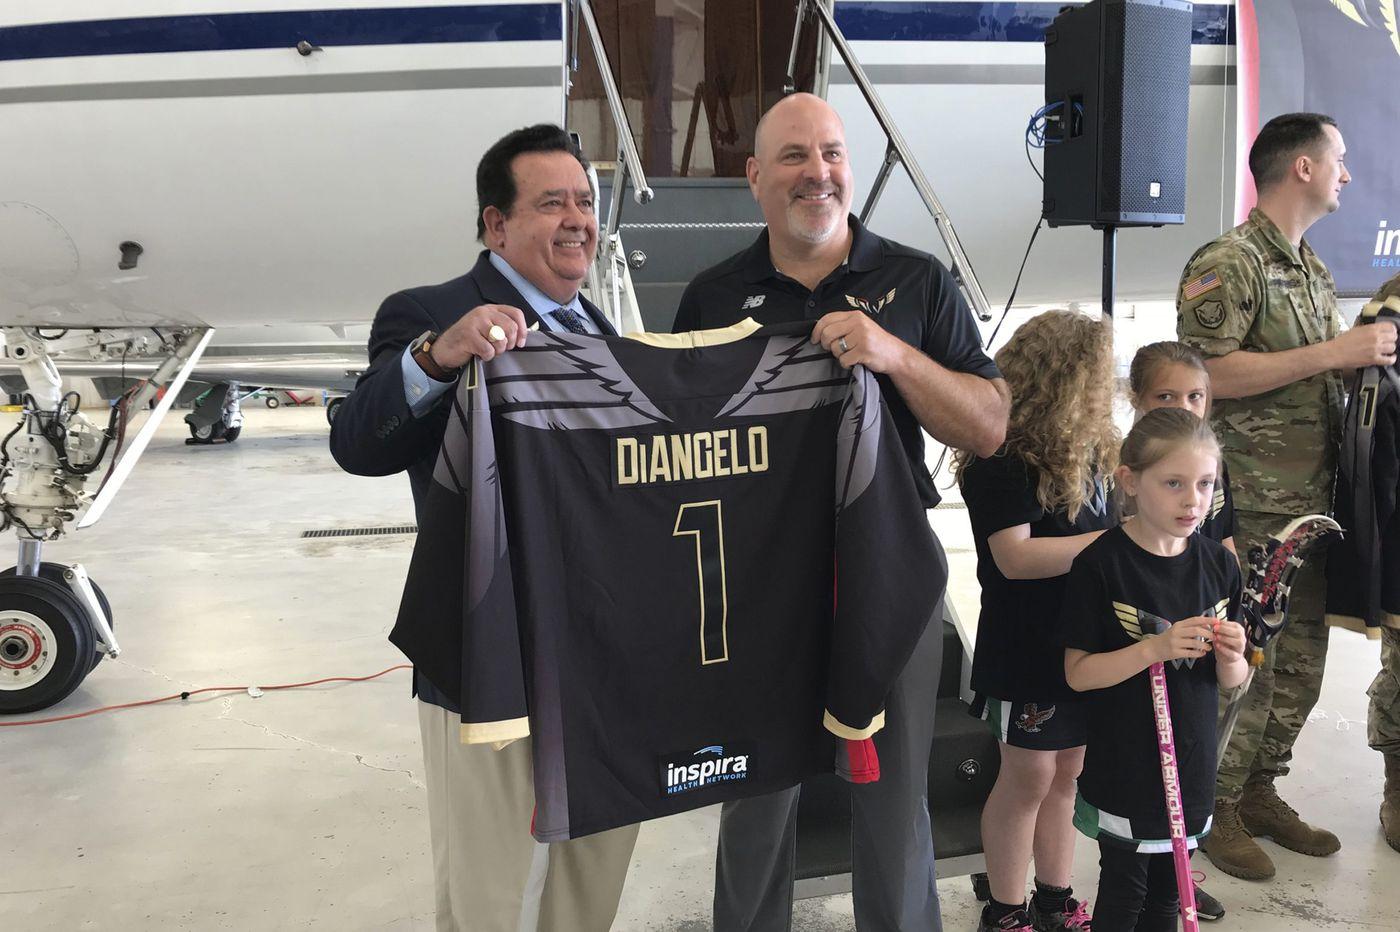 Philadelphia Wings indoor lacrosse team unveils jerseys for 2018 season